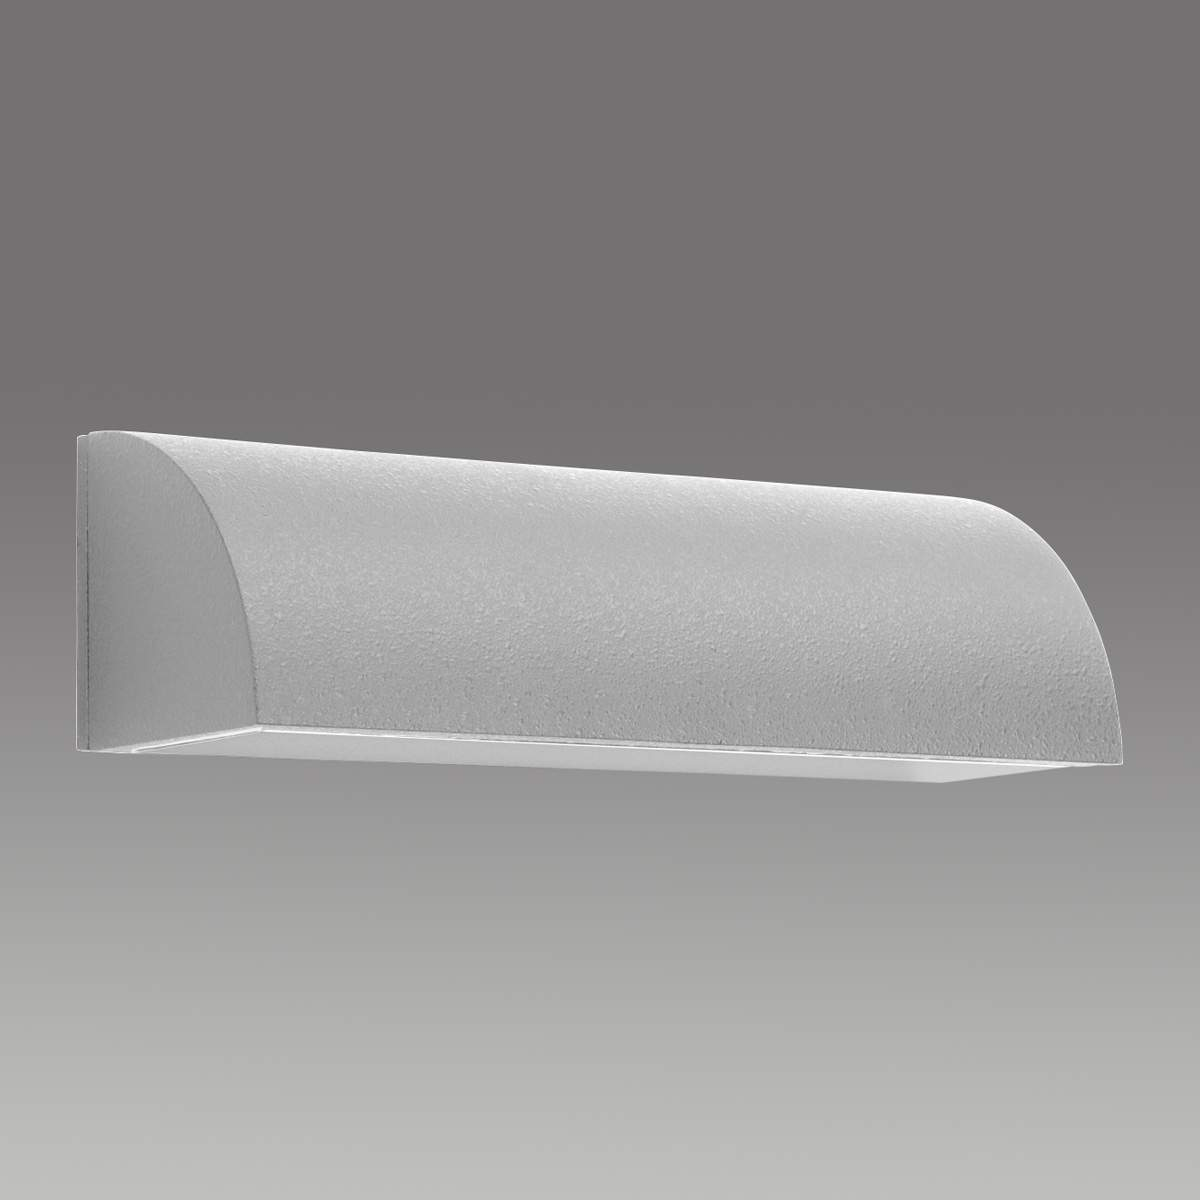 Beriwan Aluminium Wandleuchte 30 cm silber